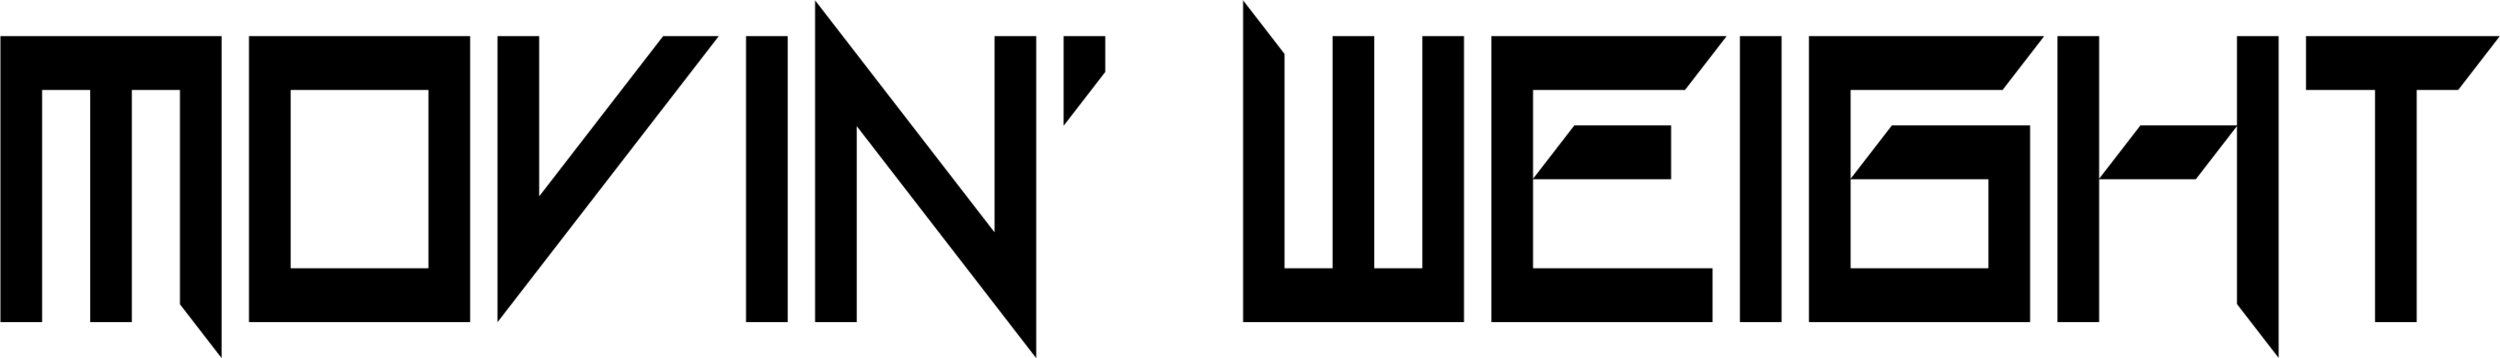 Movin Weight logo black